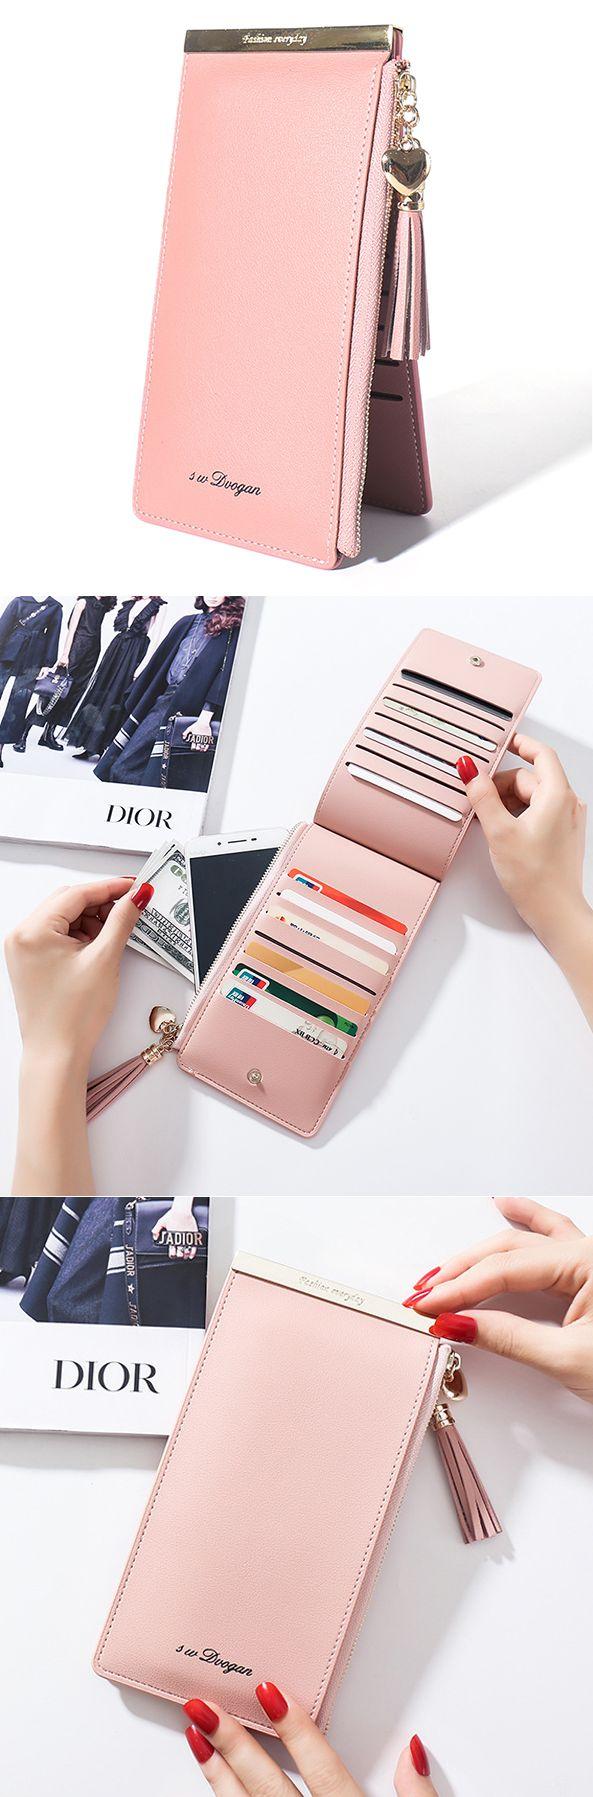 US$11.87 Only.14 Card Slots Card Holder Phone Bags Elegant Wallet Purse